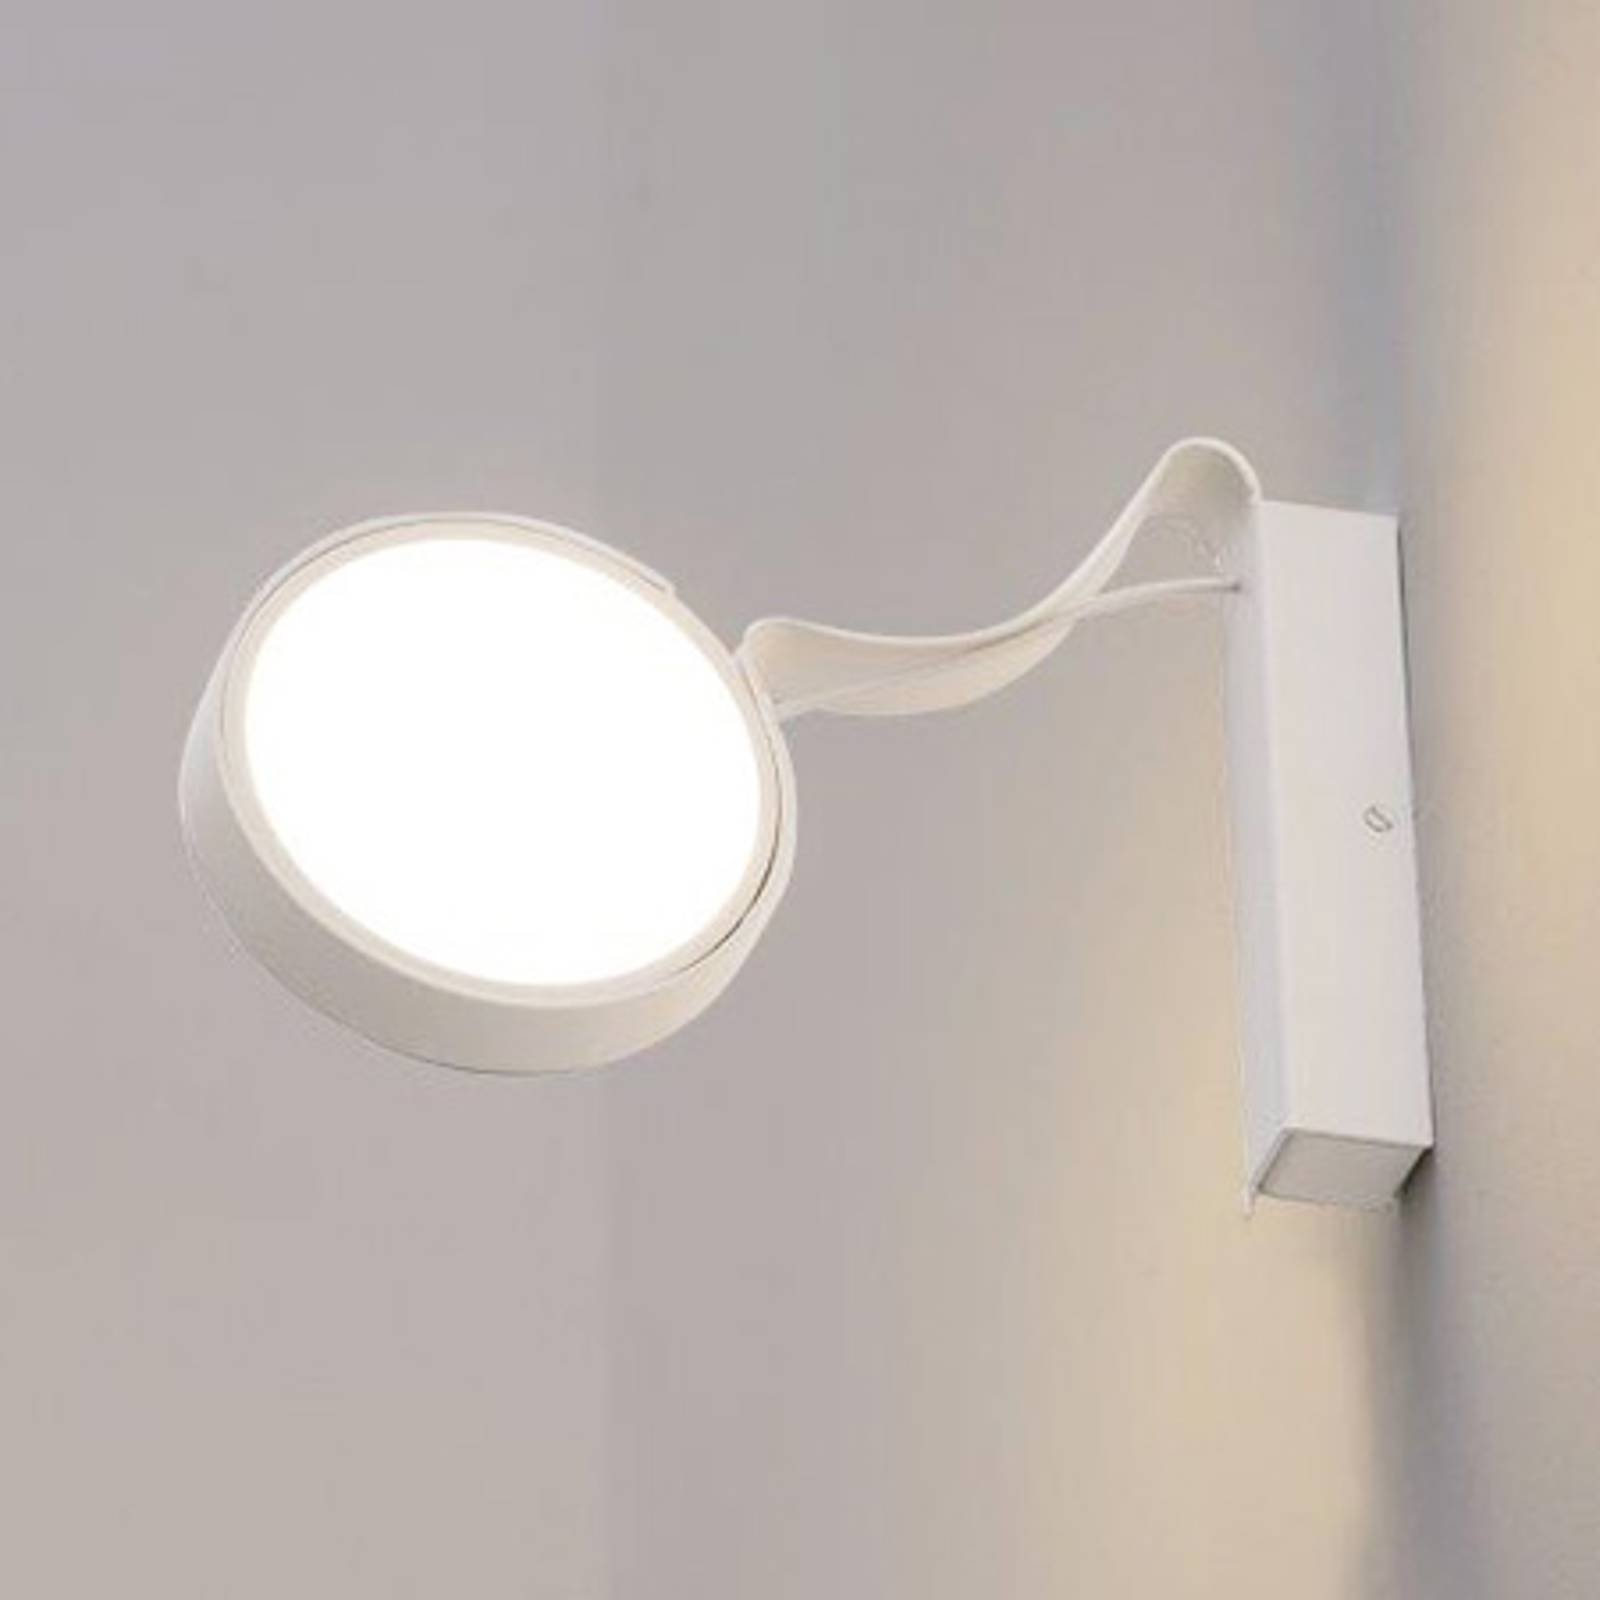 Vegglampe DND Profile med LED-lys, hvit